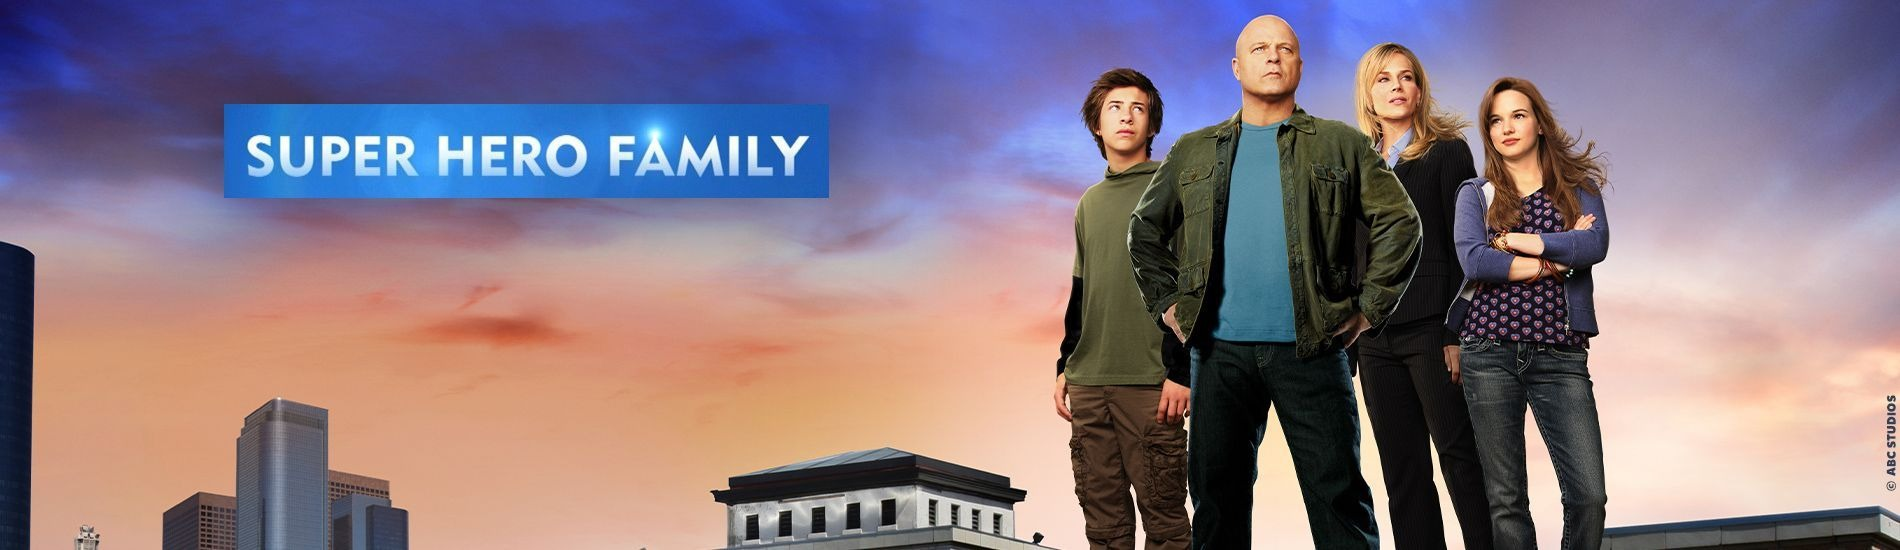 Super Hero Family en streaming sur Gulli Replay